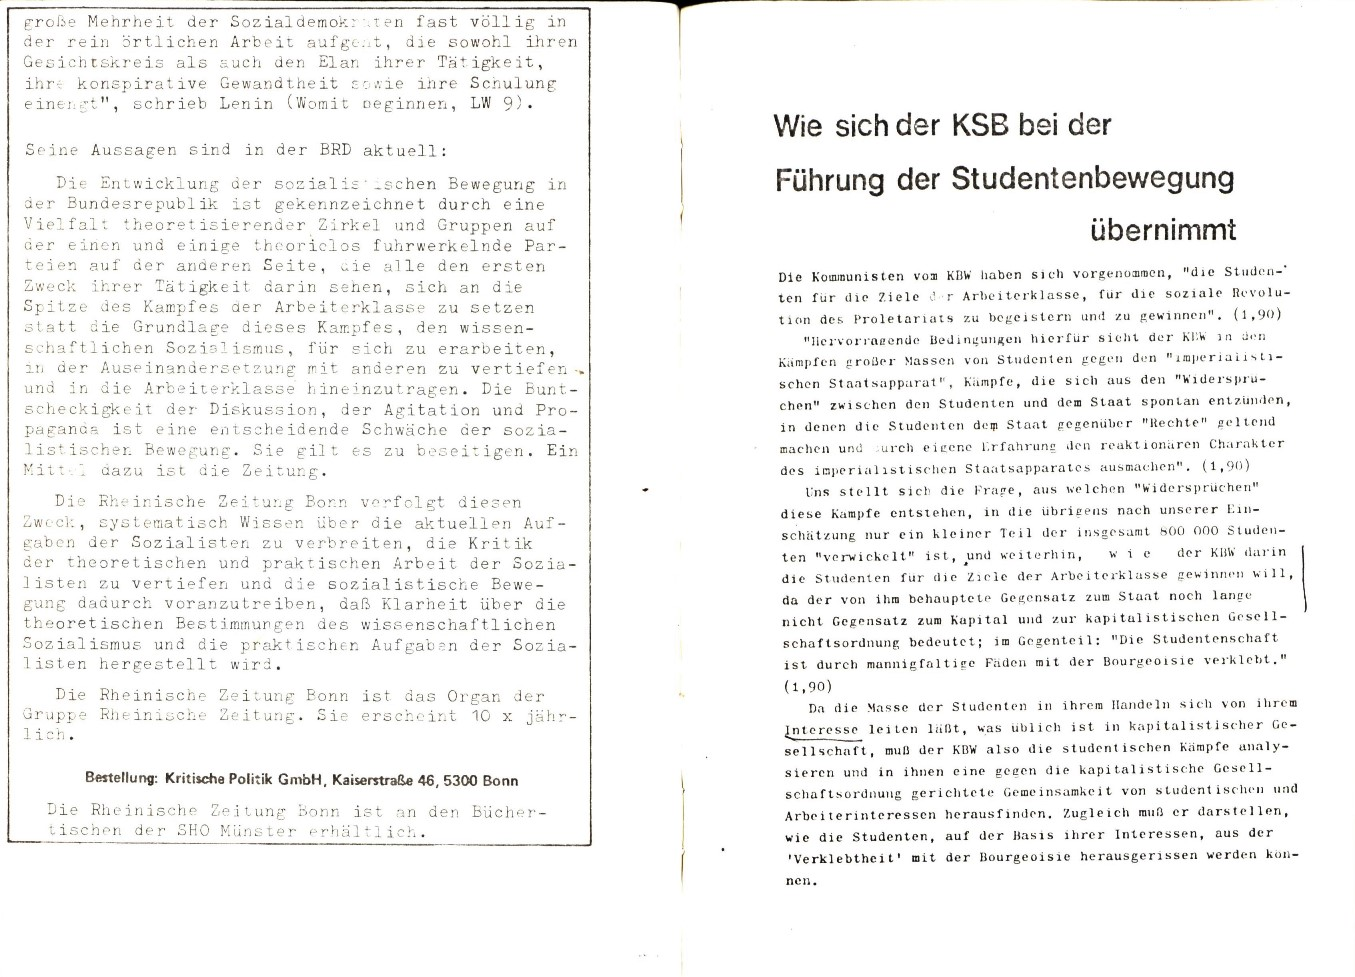 Muenster_SHO_1977_Studenteninteressen_10